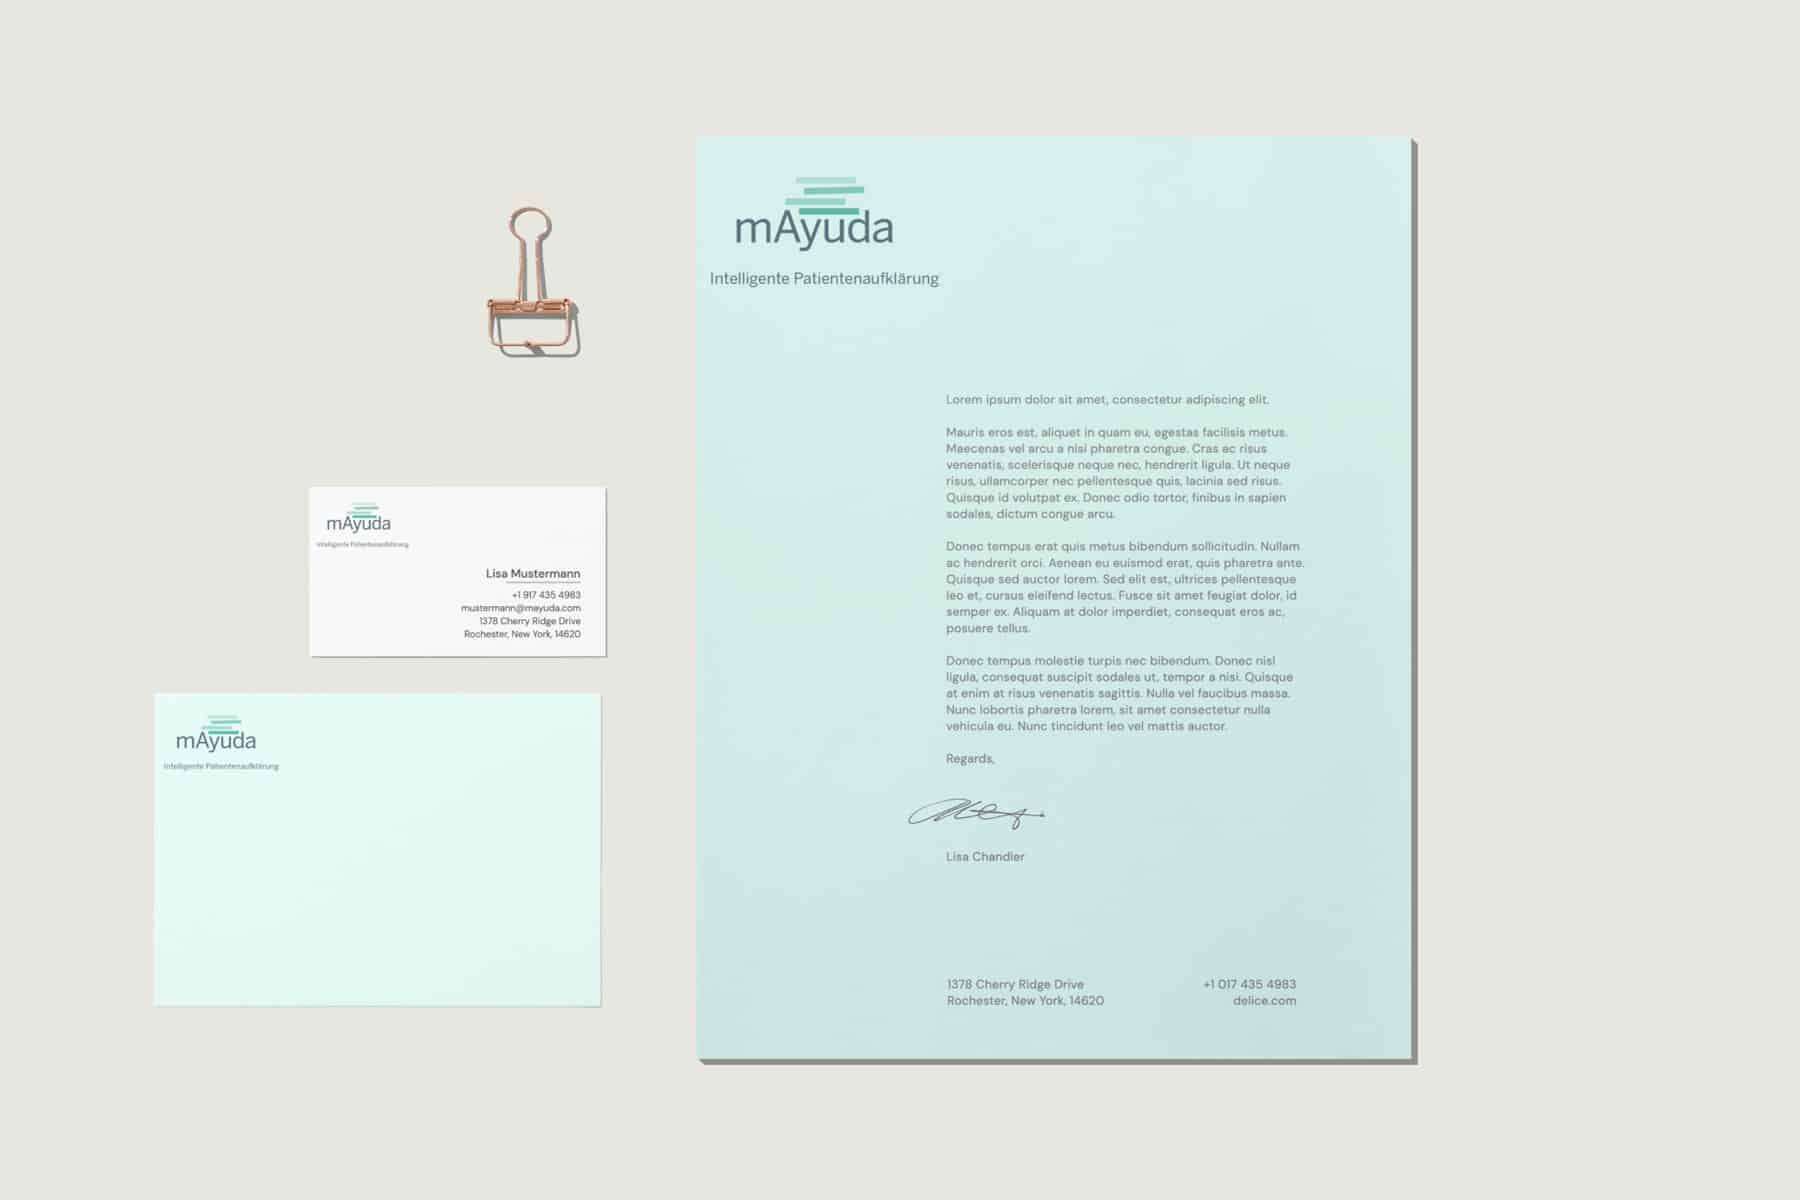 hilledesign Portfolio mAyuda Corporate Design und Logo Design